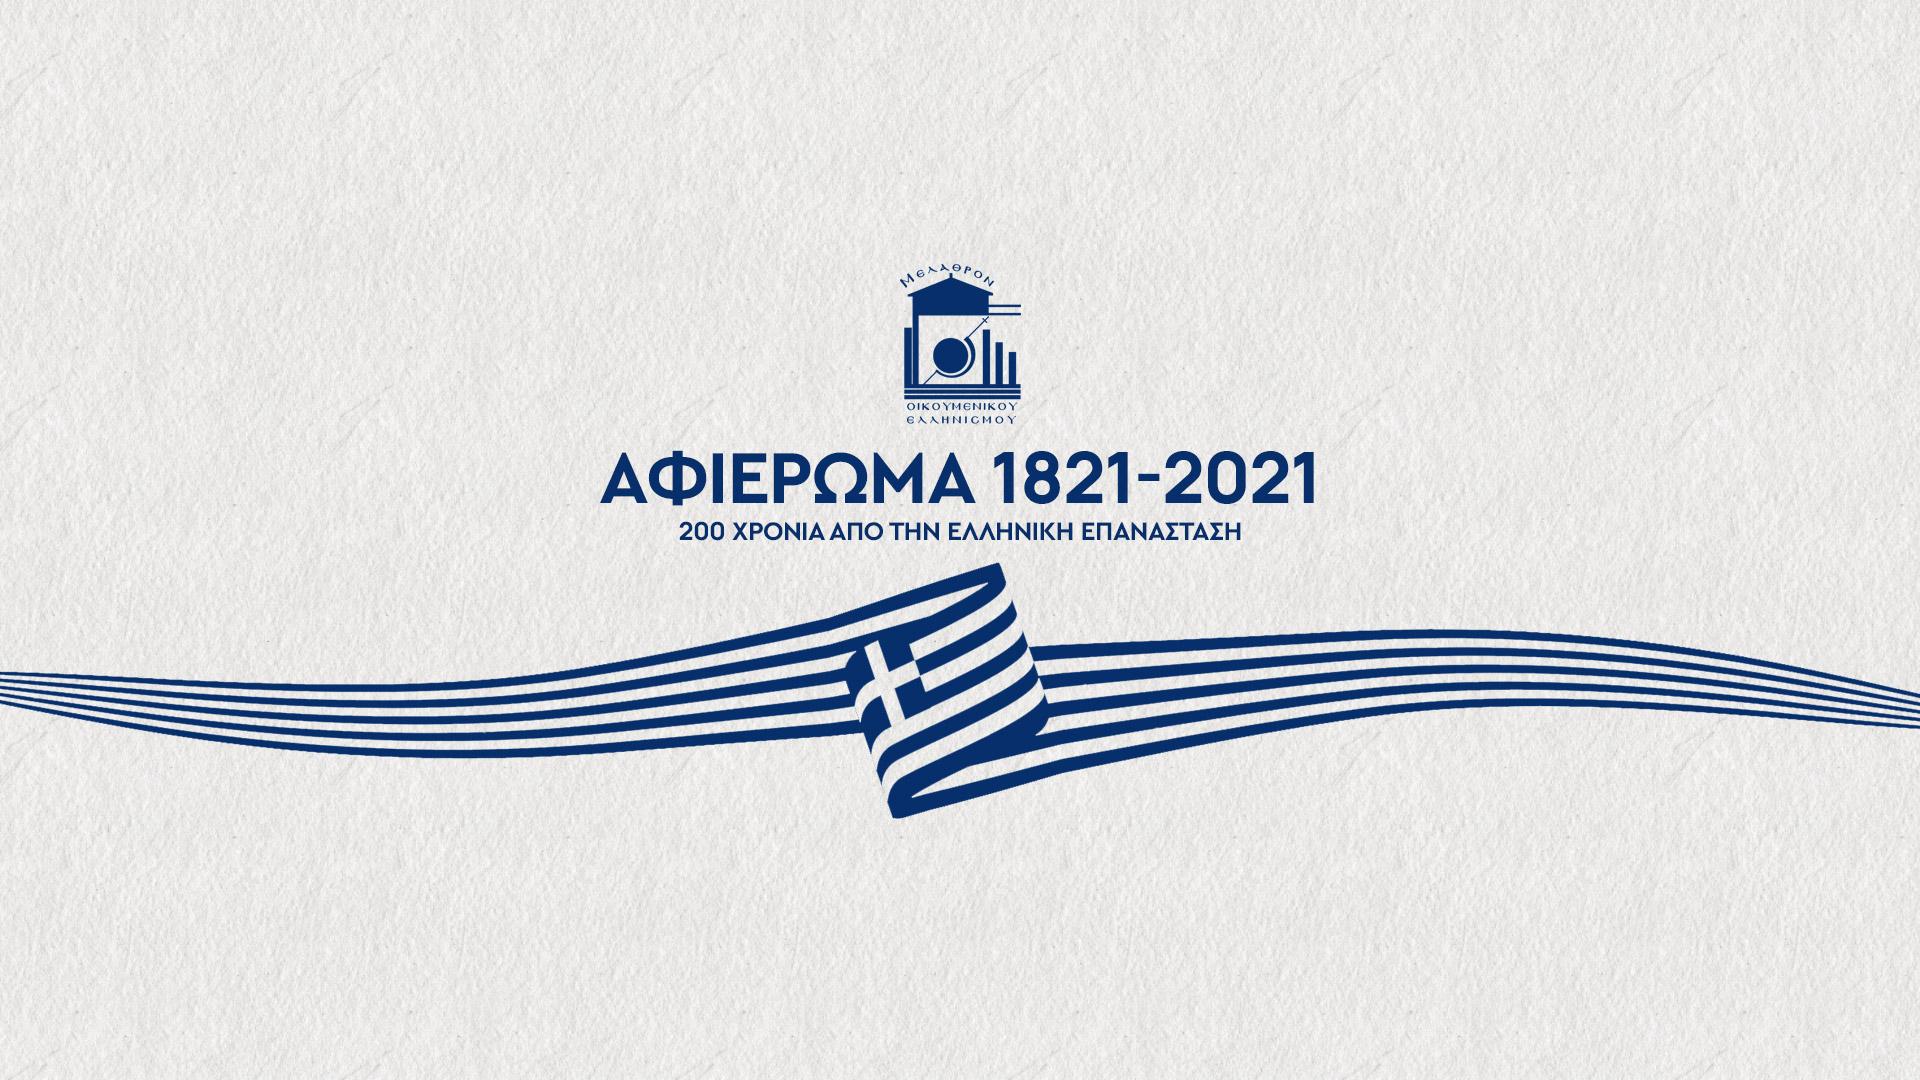 You are currently viewing Η Επανάσταση του '21 ως σύμβολο της ενότητας των Ελλήνων